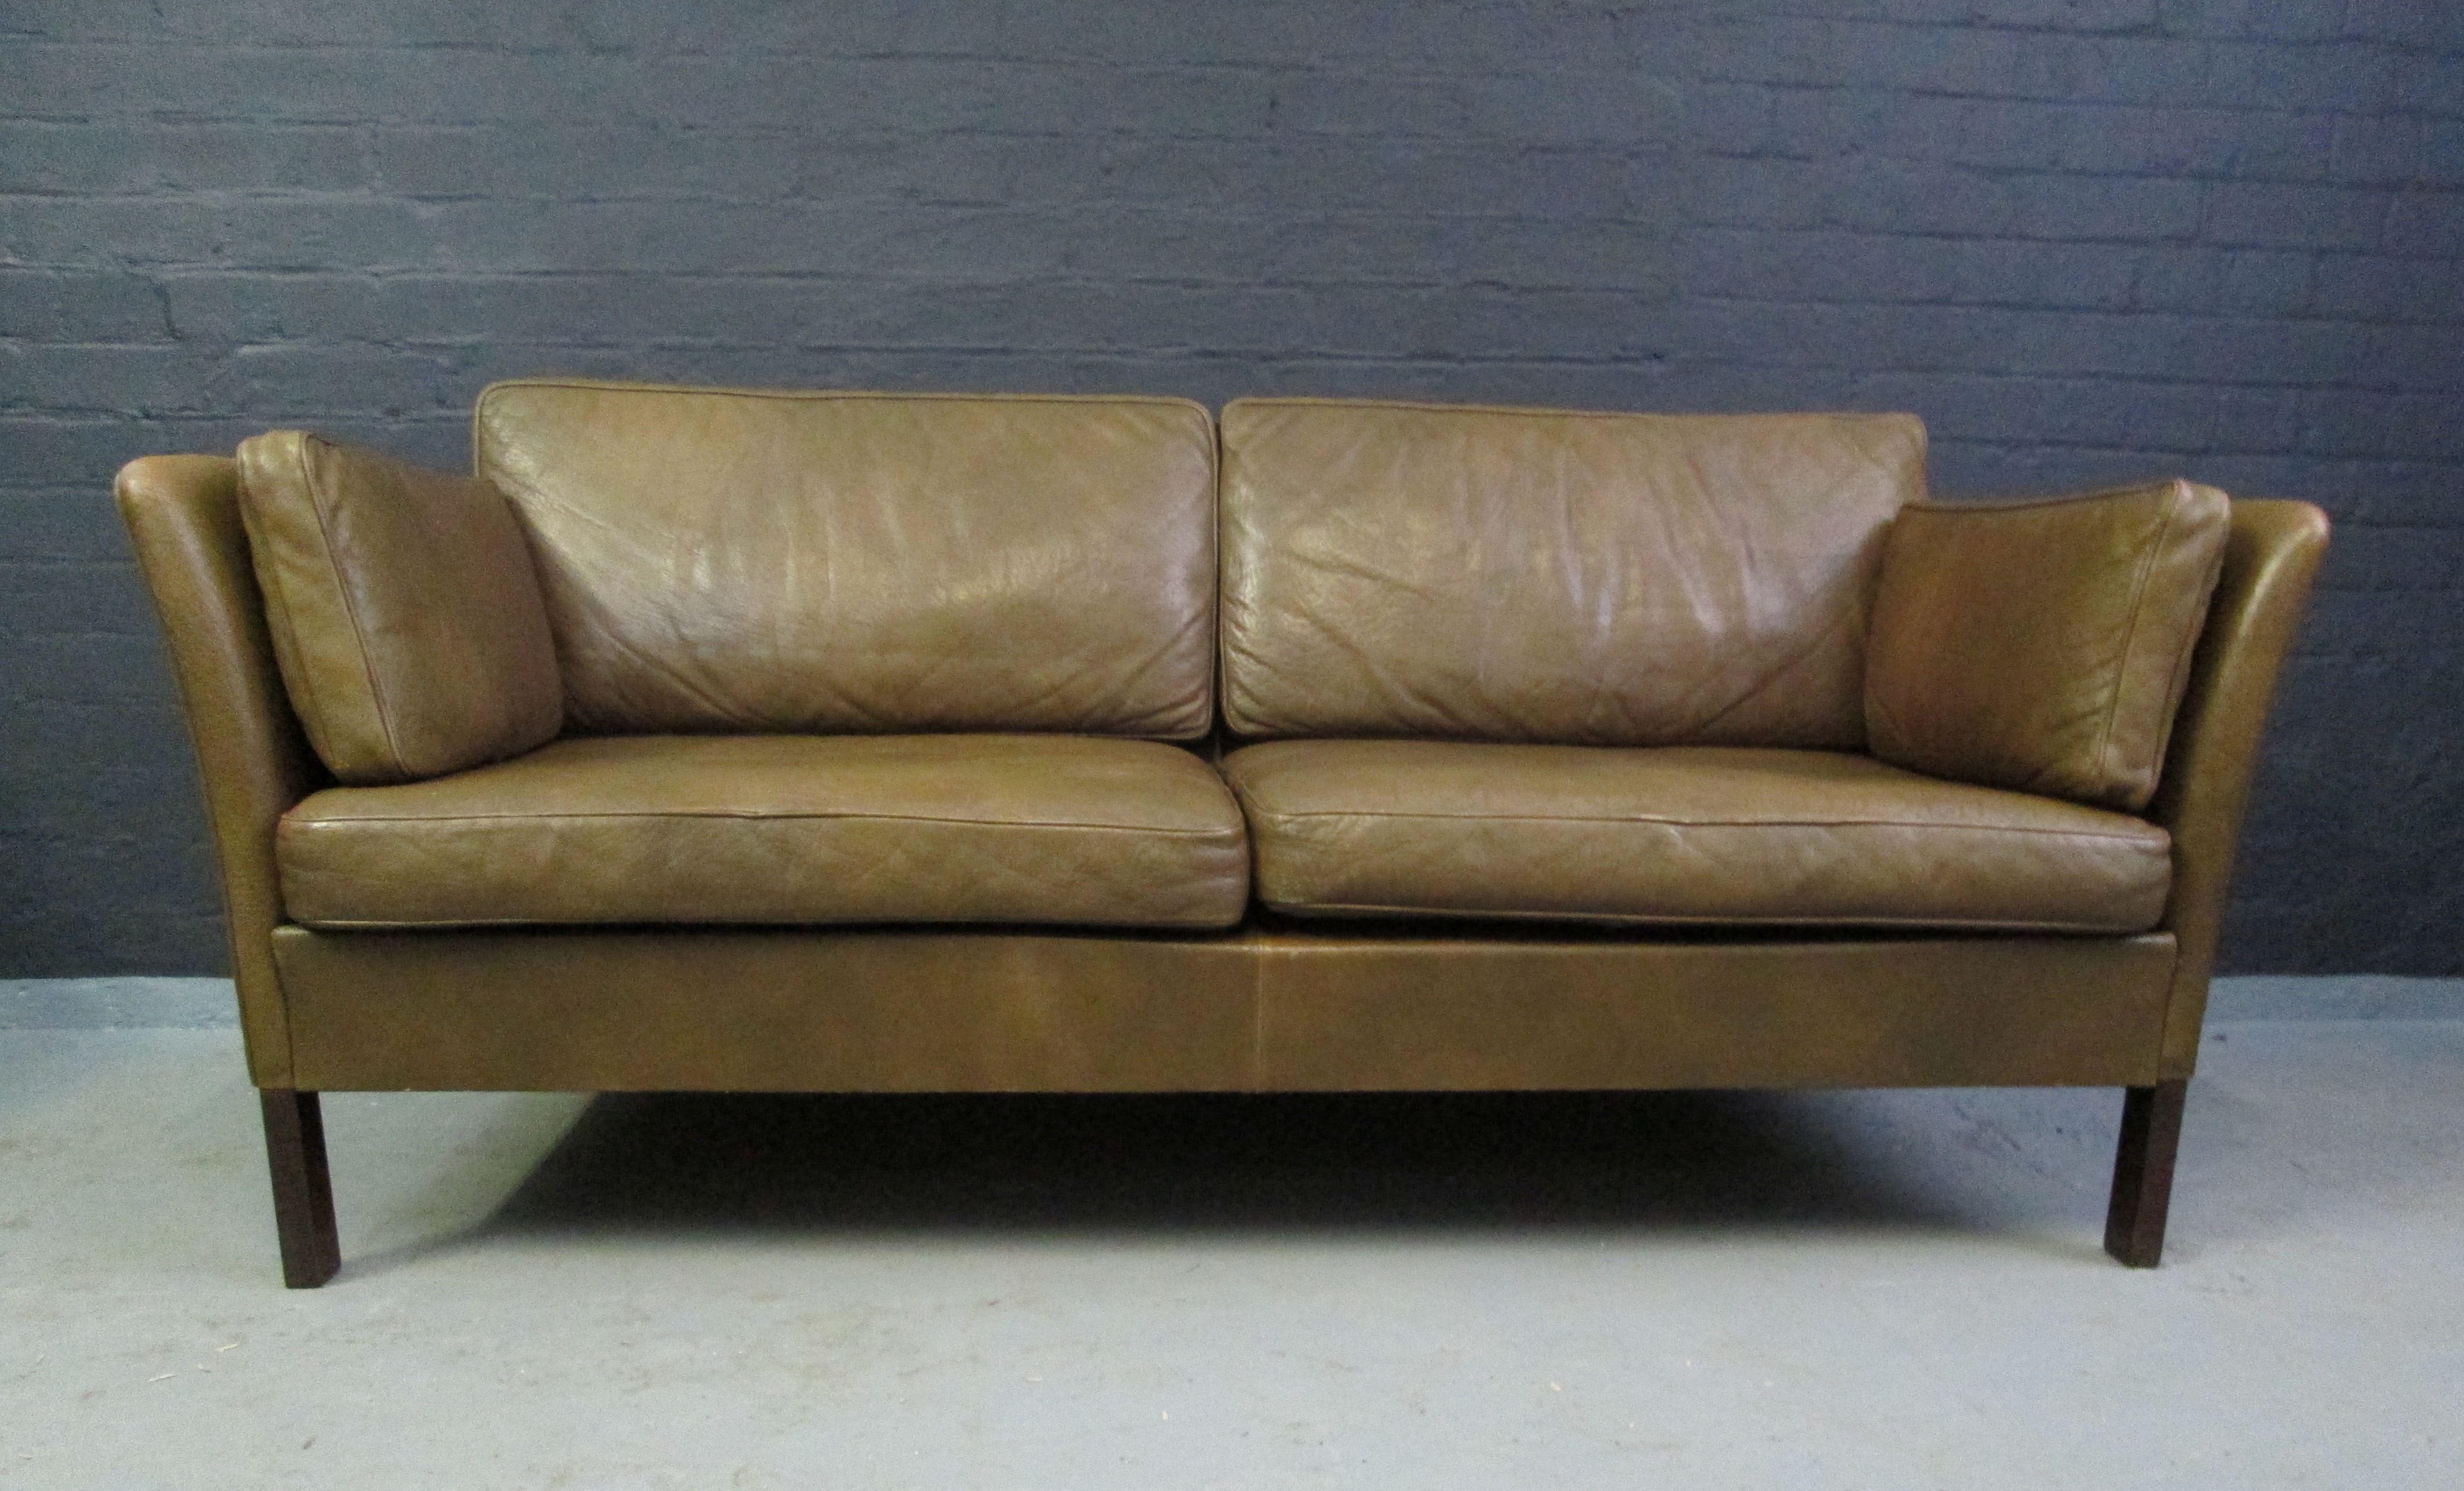 Classic Danish olive green leather sofa www.archivefurniture.co.uk ...